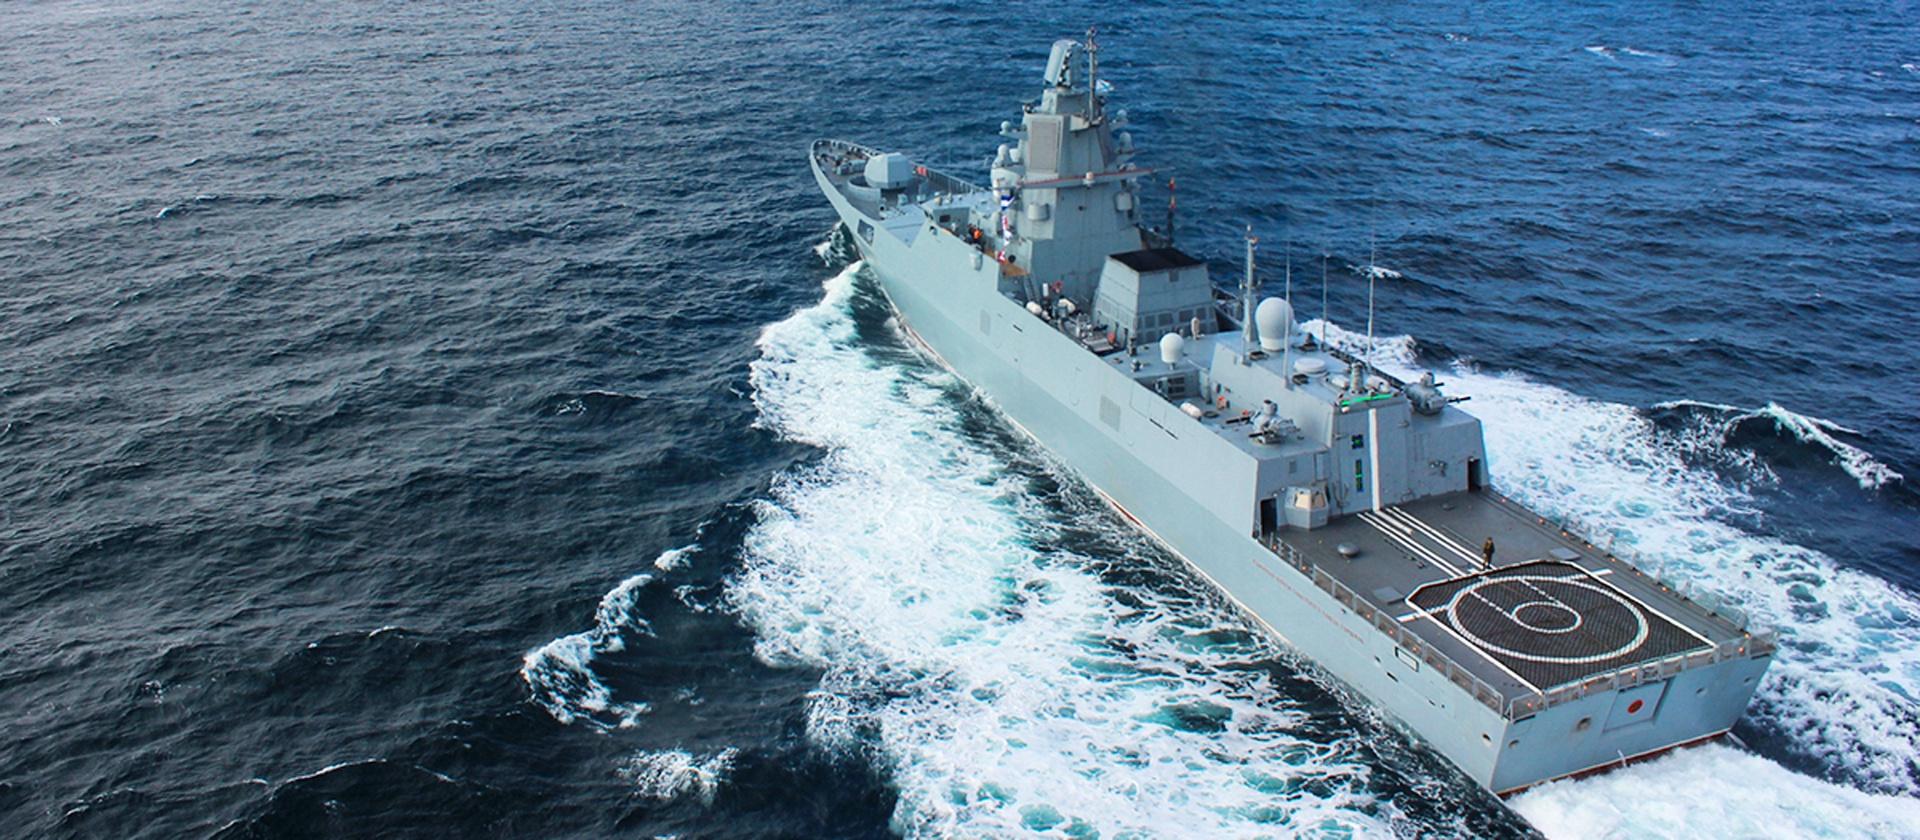 Жесткое излучение «Адмирала флота Касатонова»